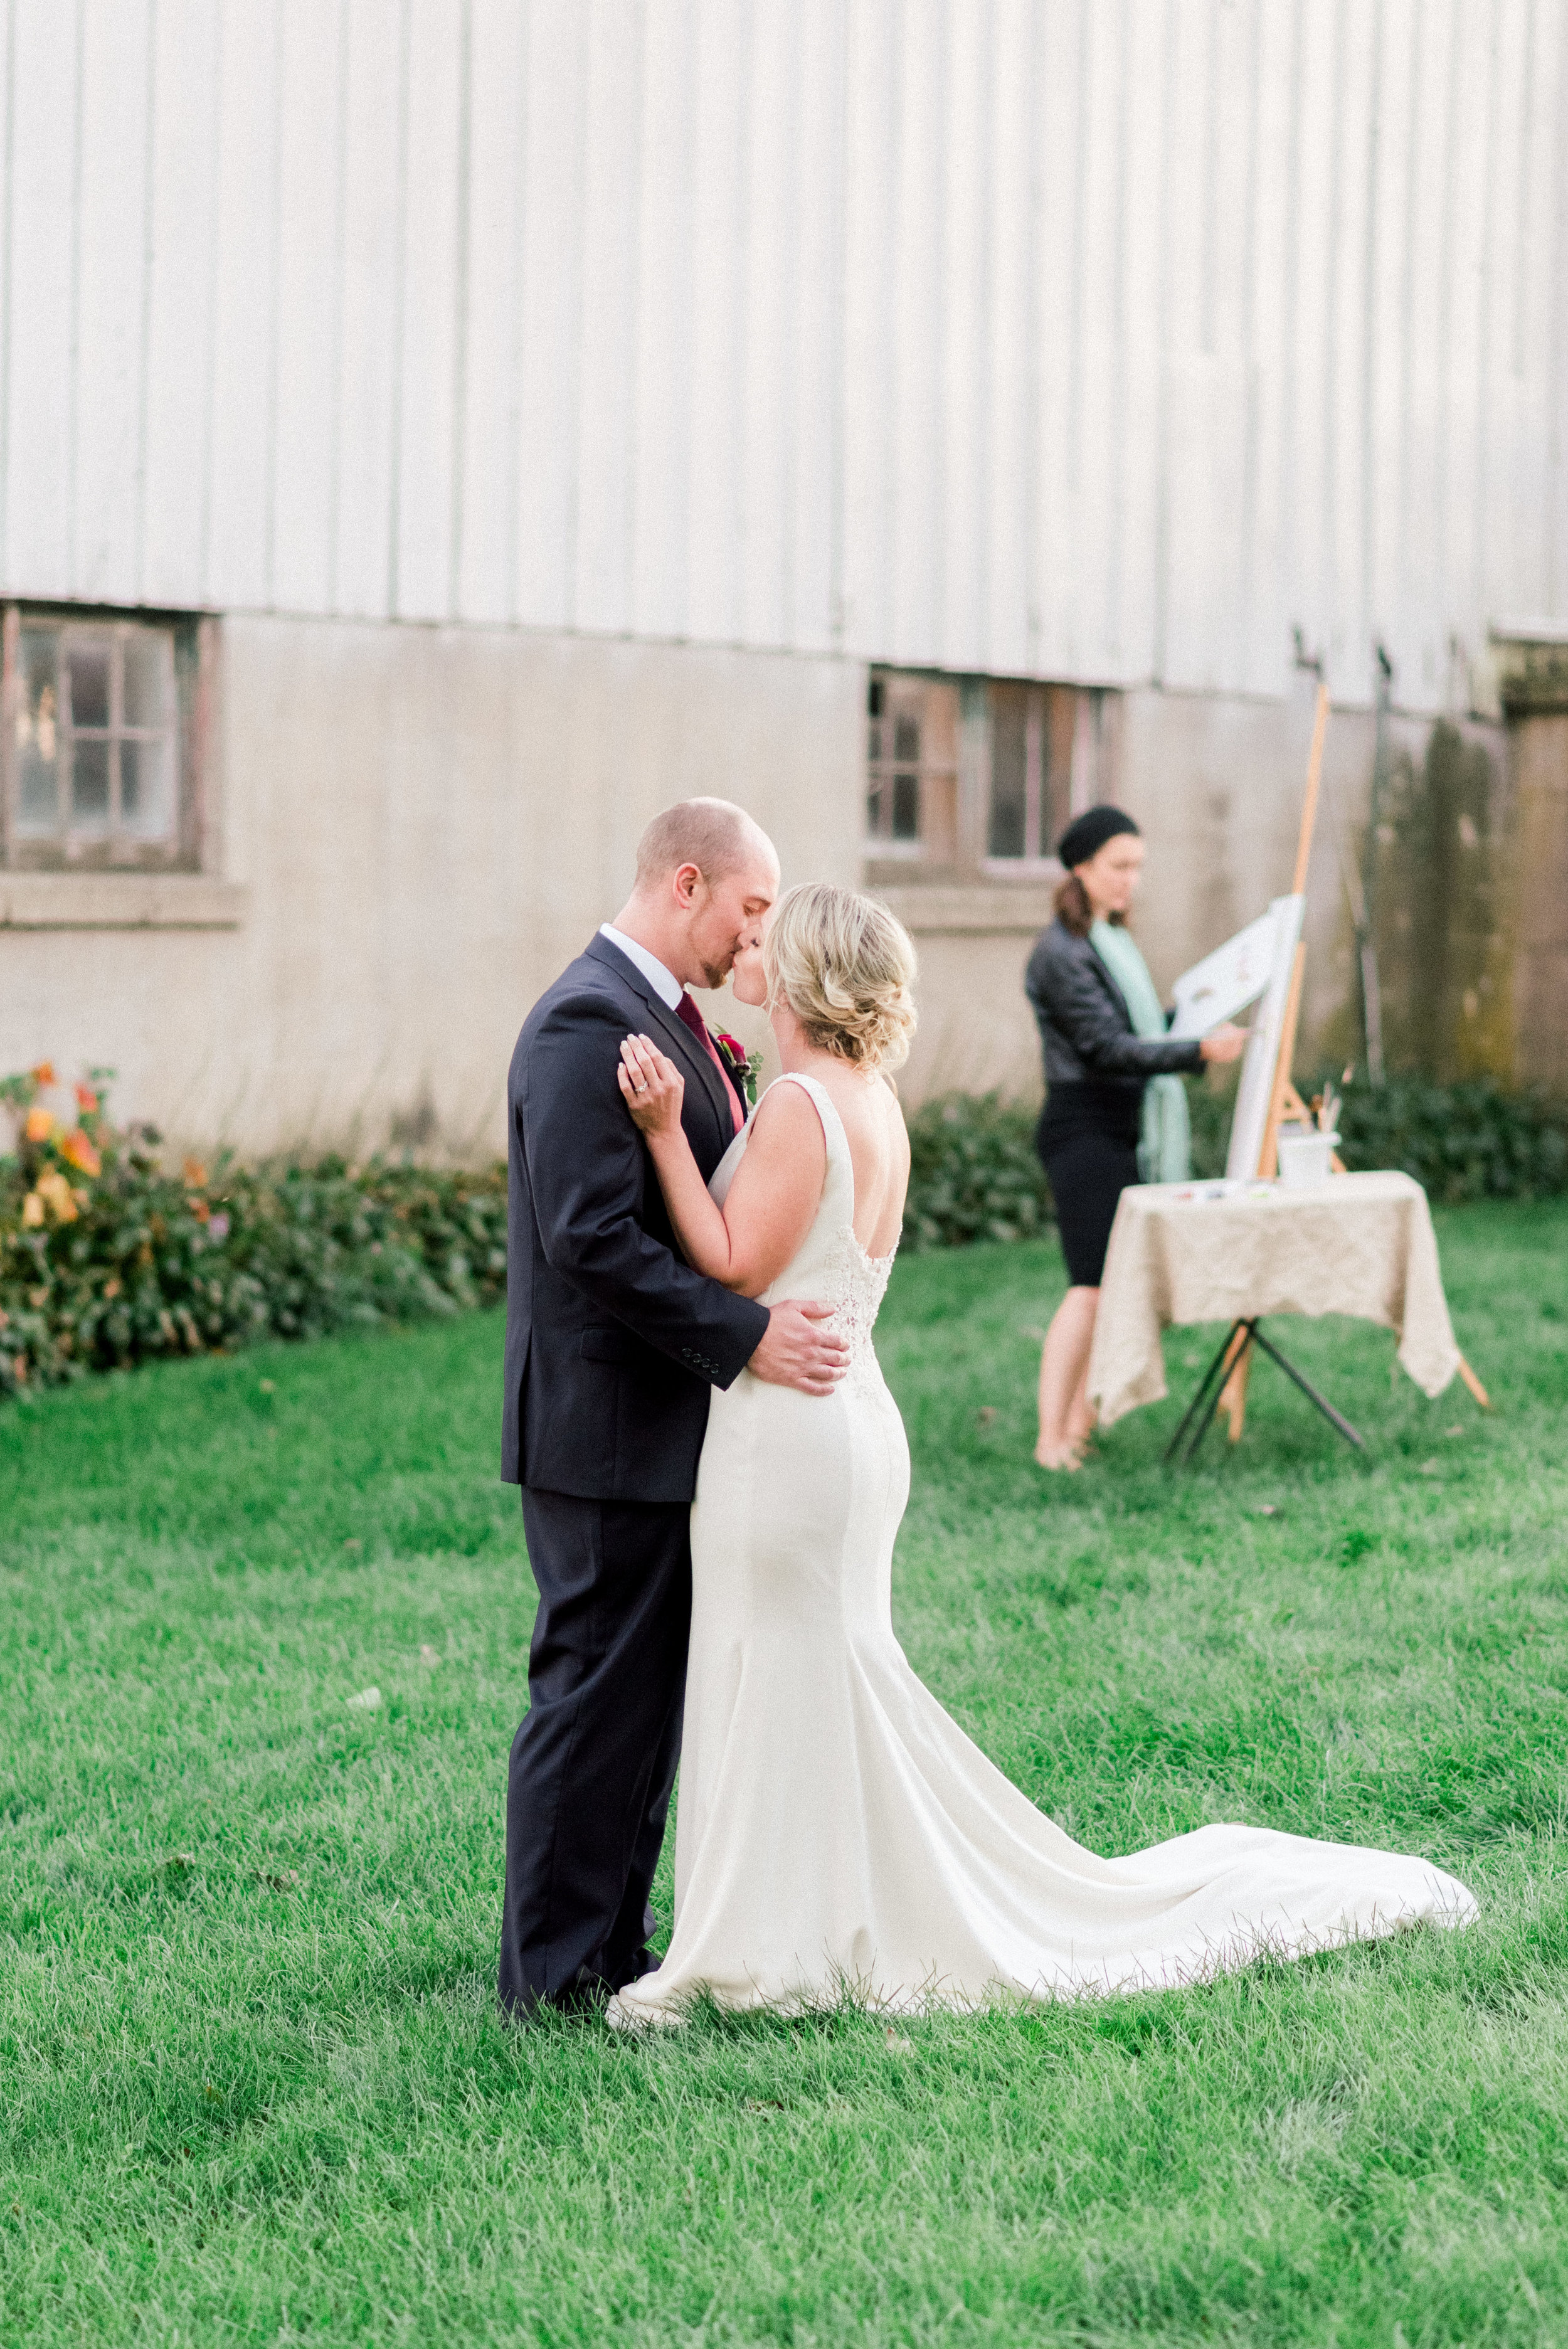 Villa Buonincontro - Fort Atkinson WI- Love Madison Weddings - Styled Shoot -76.jpg